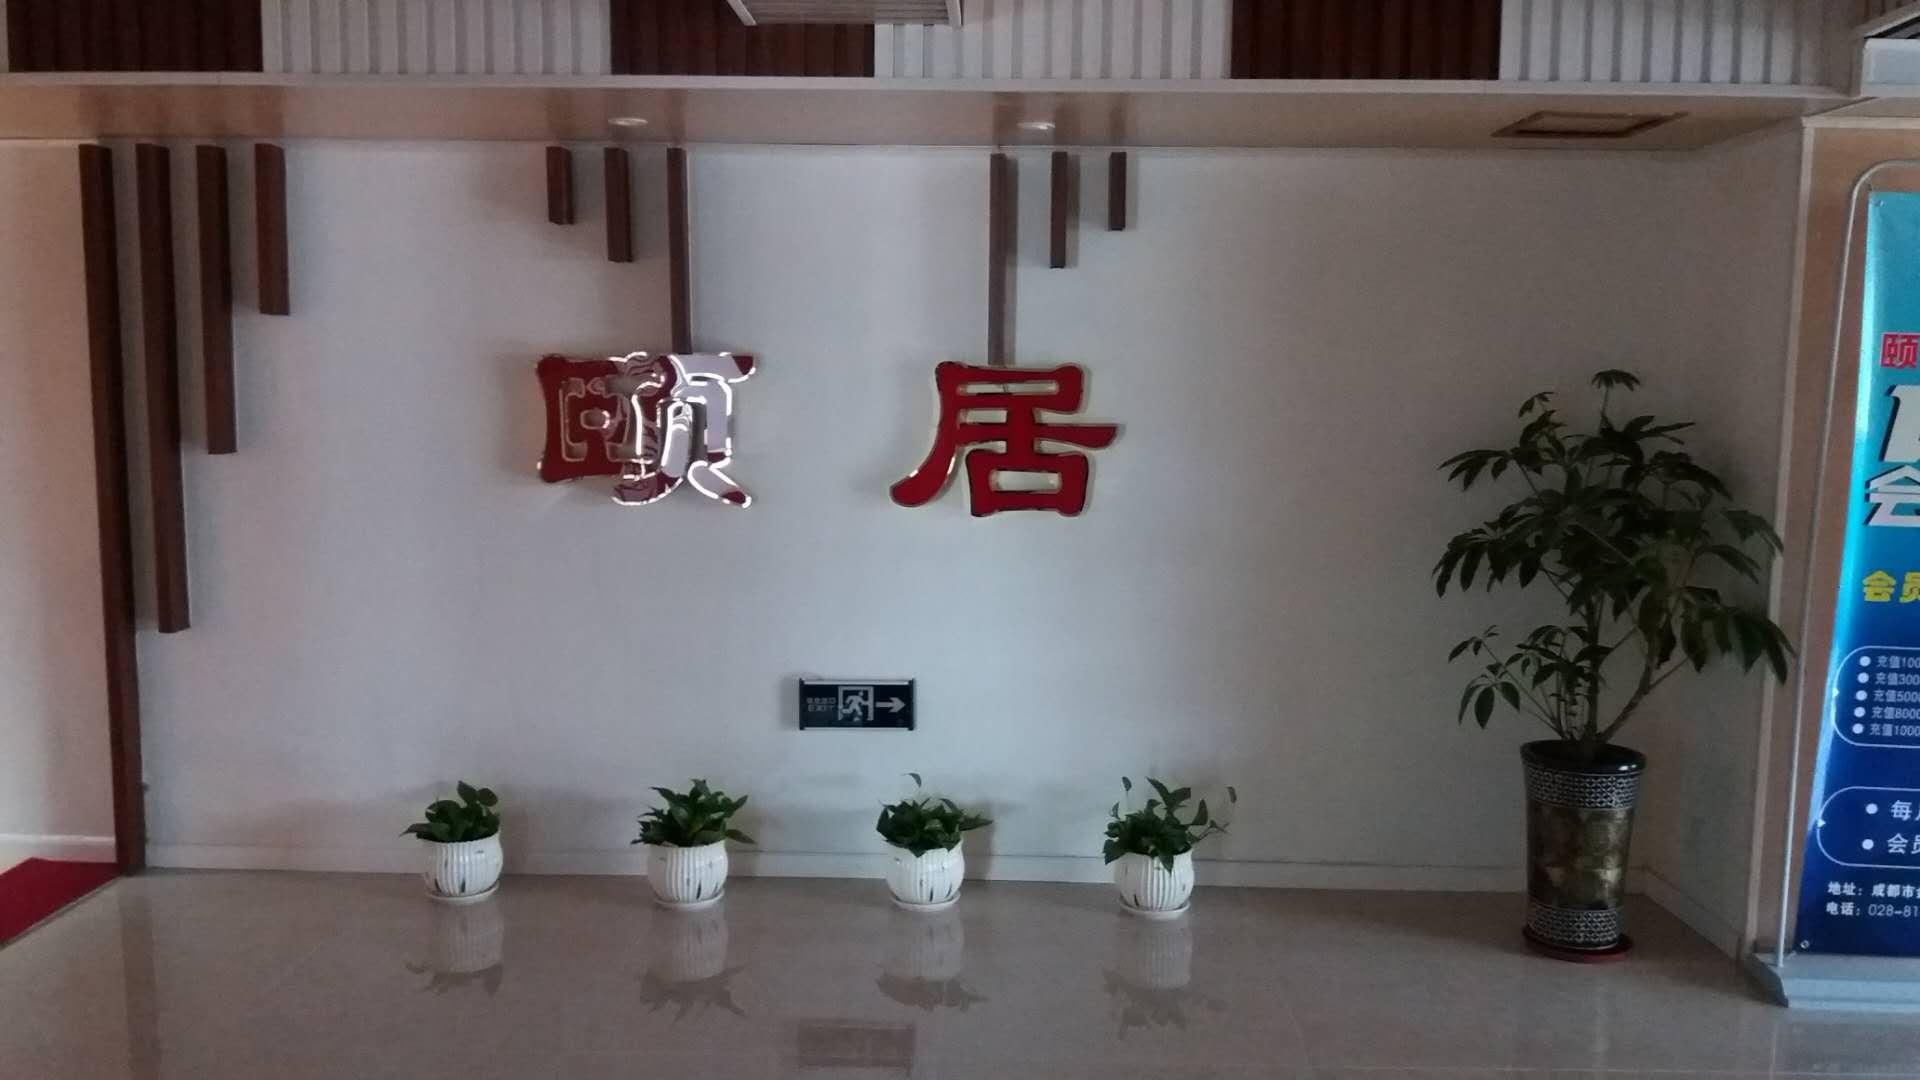 betway必威app_成都市颐居家酒店租赁betway必威app牌999系列饮水机